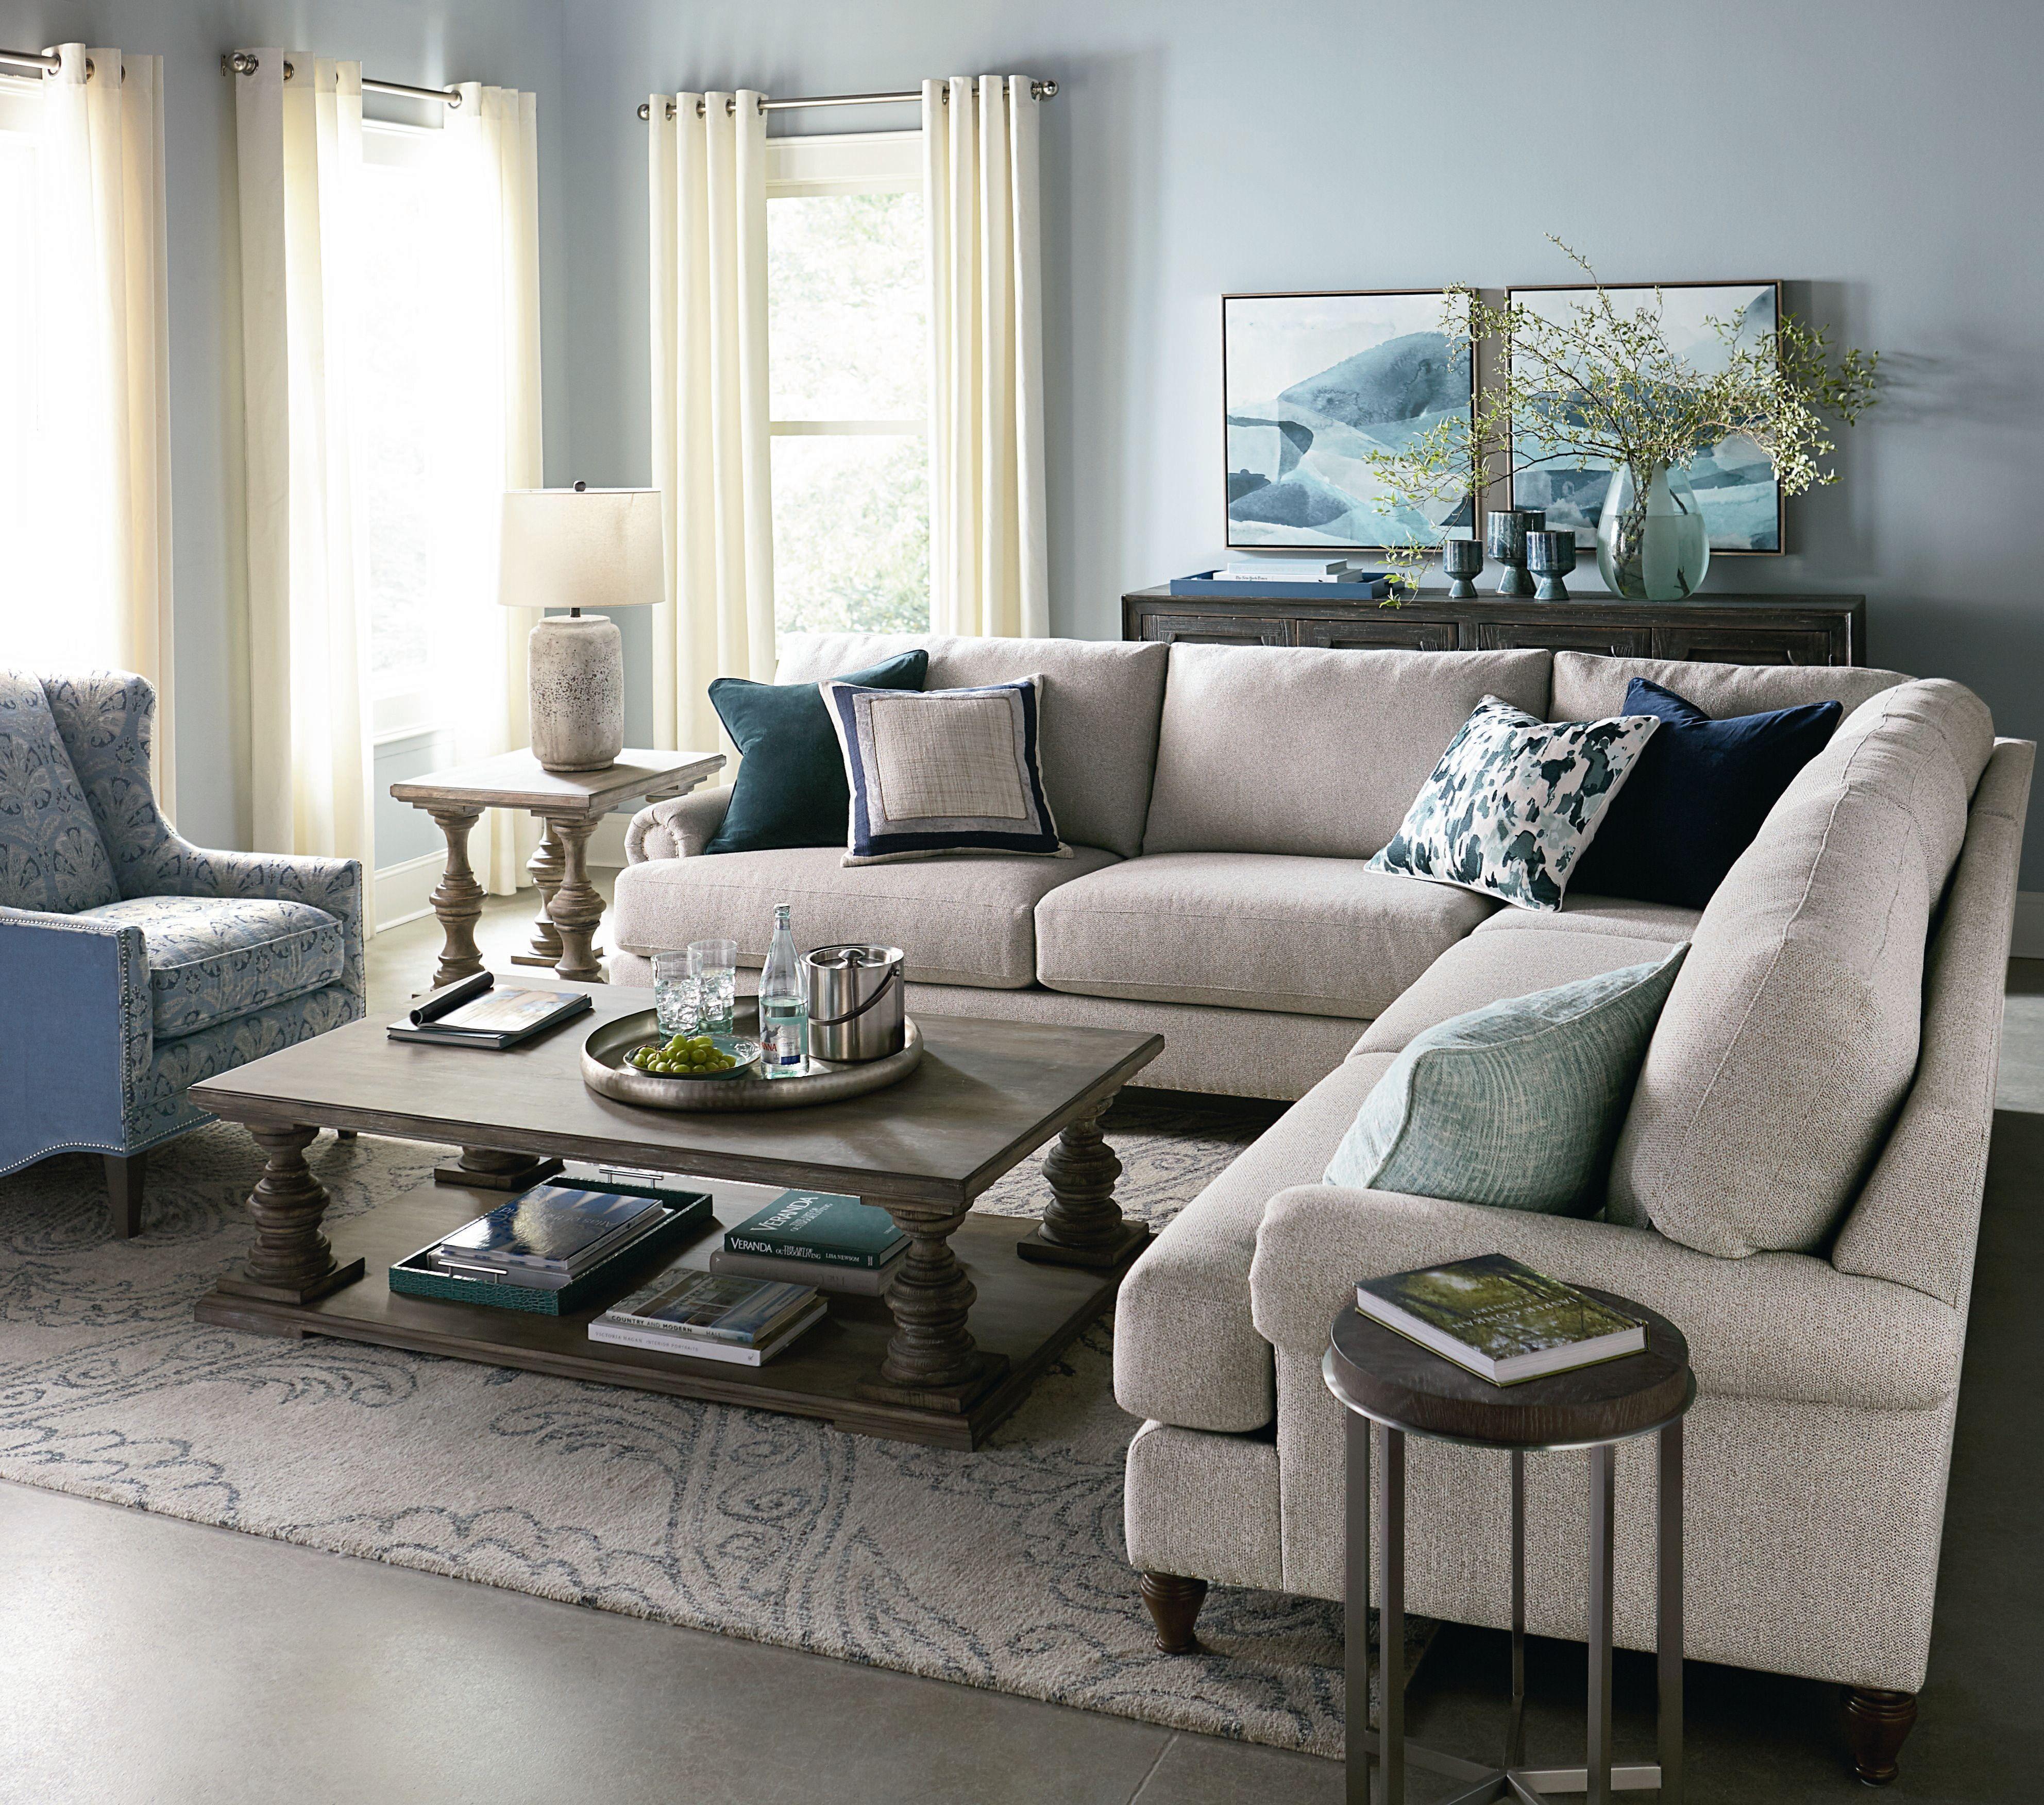 Hunter Large L Shaped Sectional Modular Living Room Furniture Sofa Design Living Room Inspiration L living room furniture